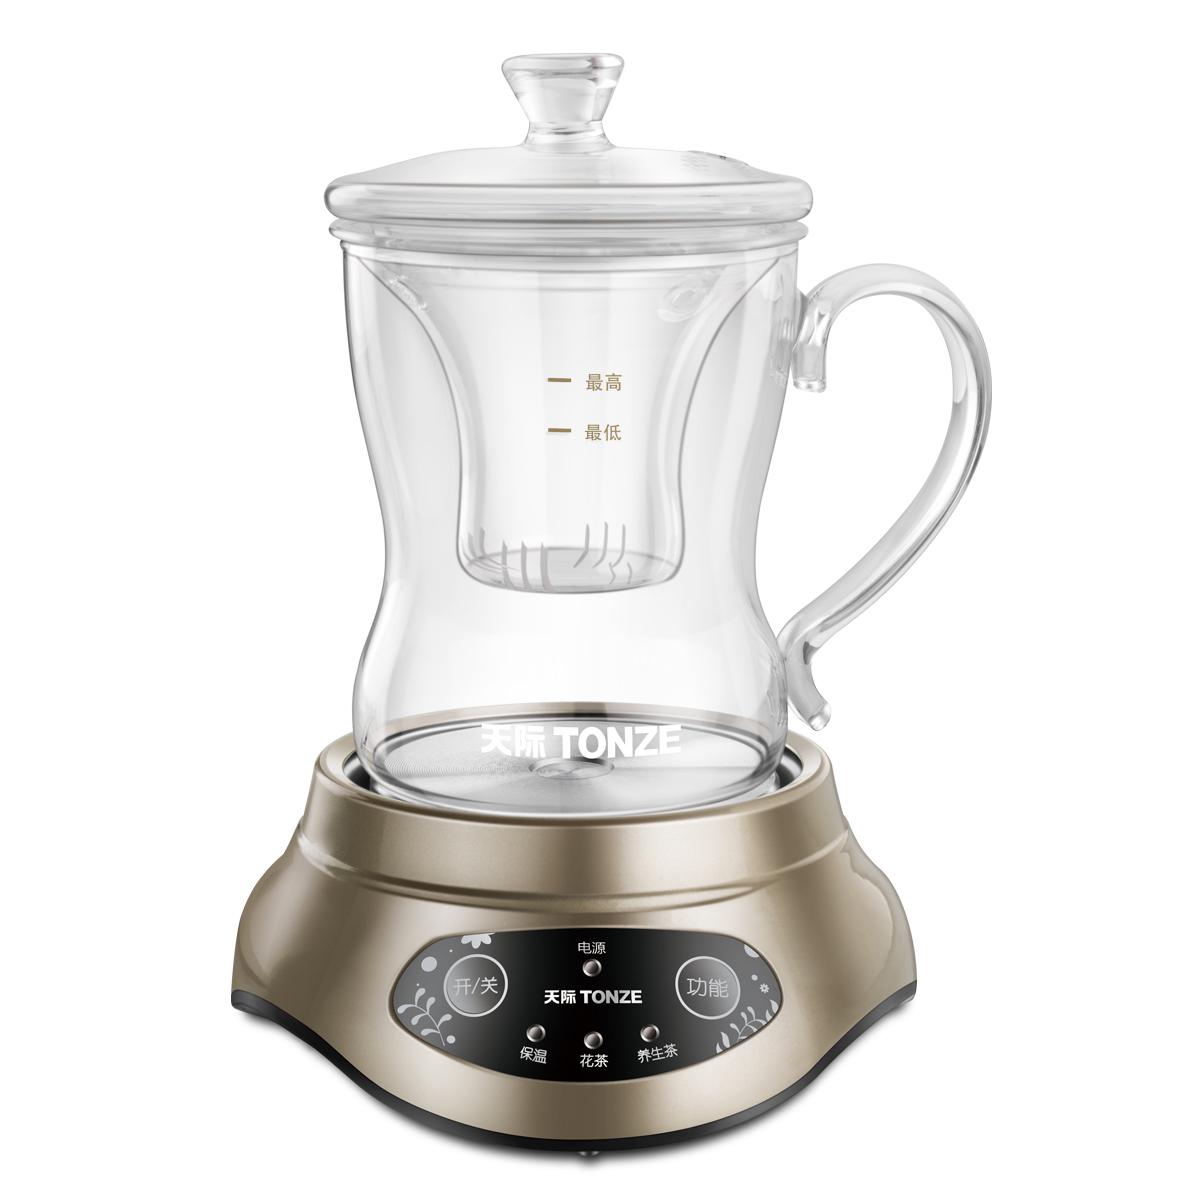 Tonze-天际 BJH-W35Q电热水杯好不好,安全吗